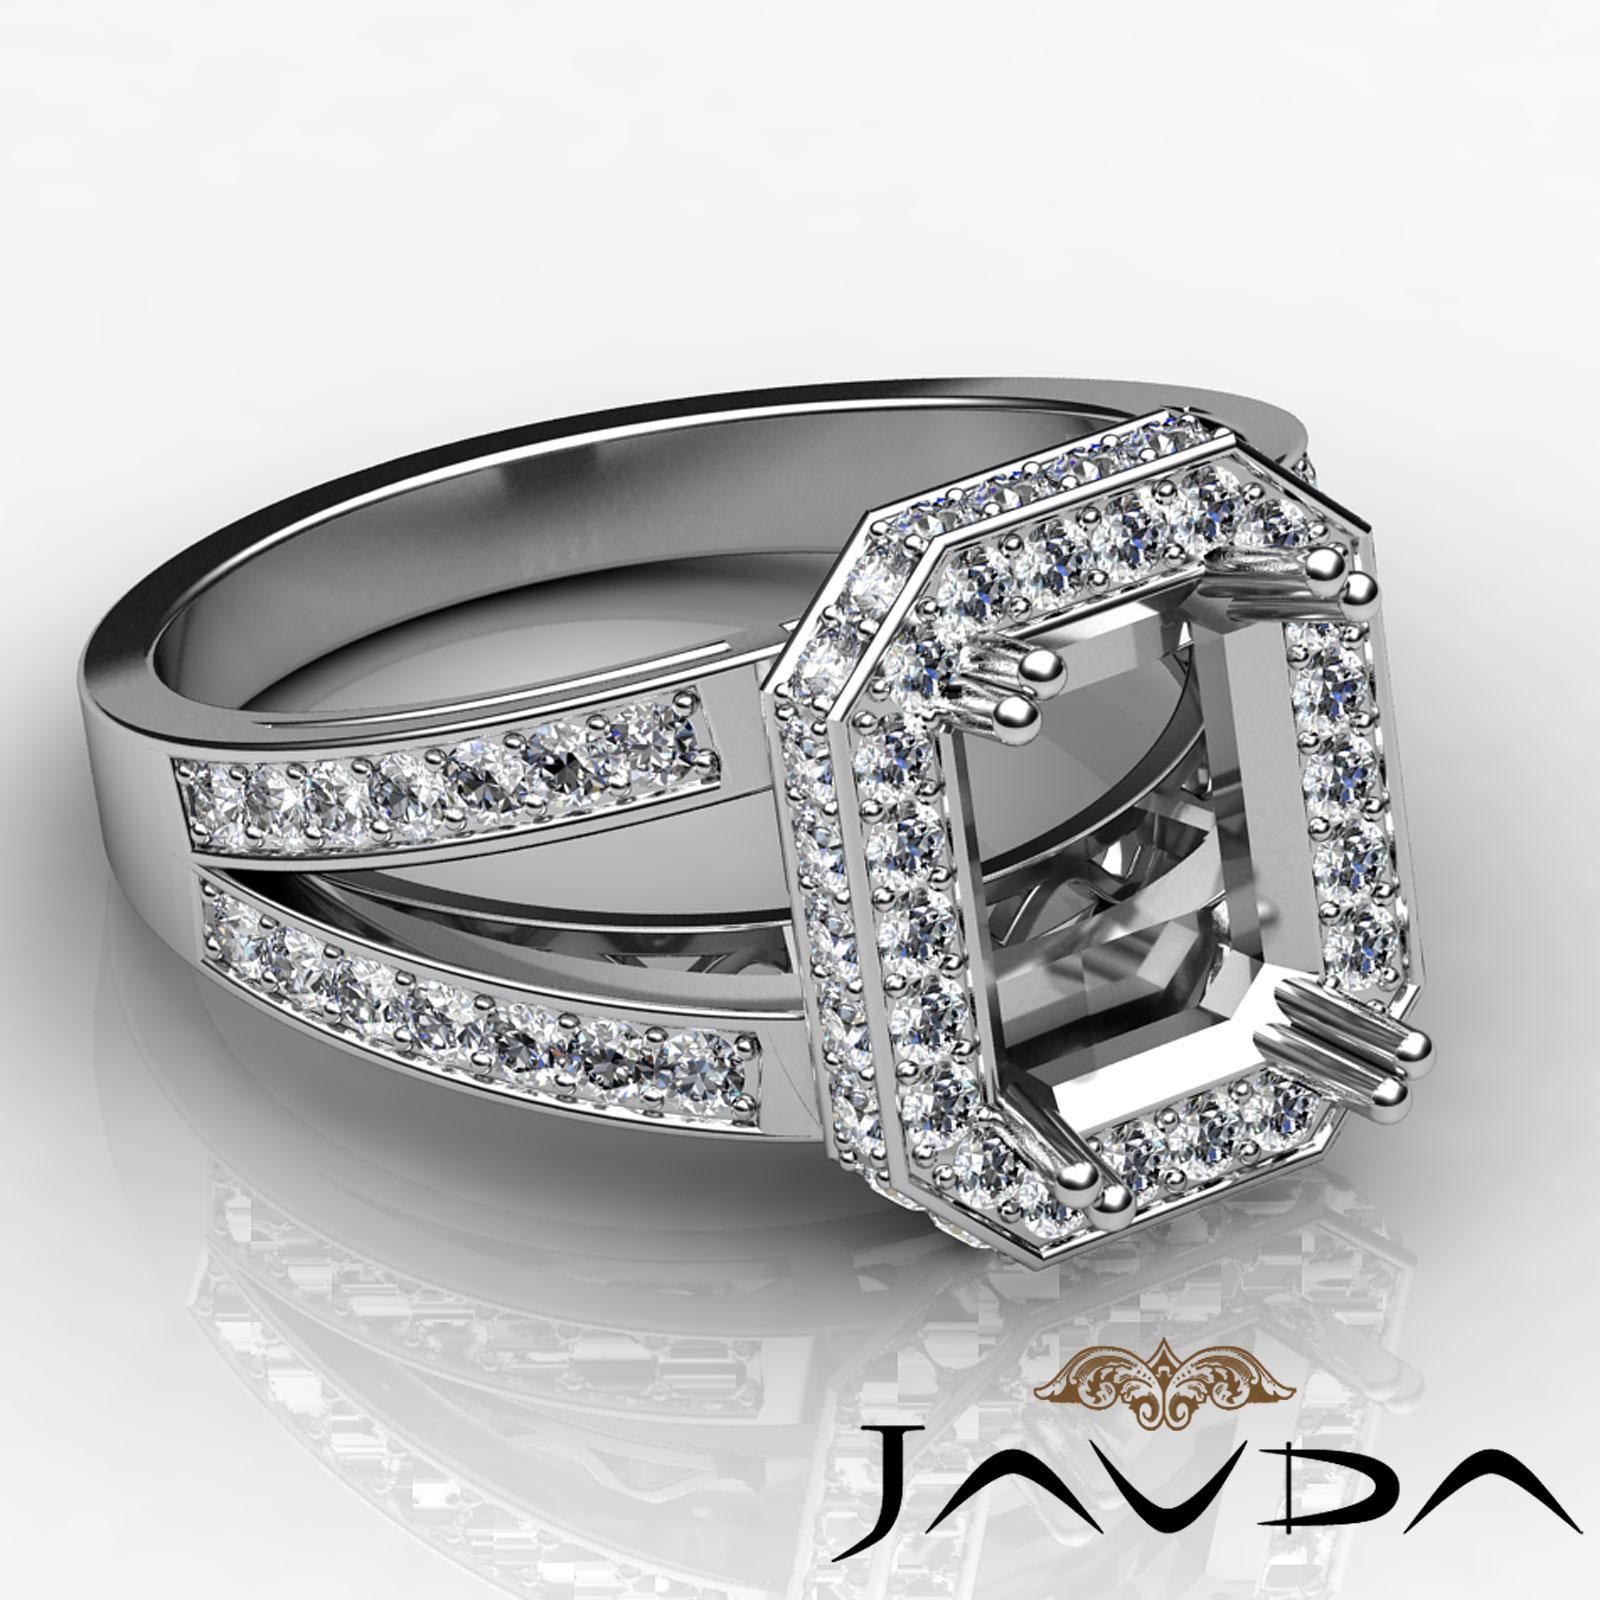 Emerald Cut Halo Diamond Engagement Rings: 14k White Gold Halo Pave Diamond Engagement Ring 0.84Ct